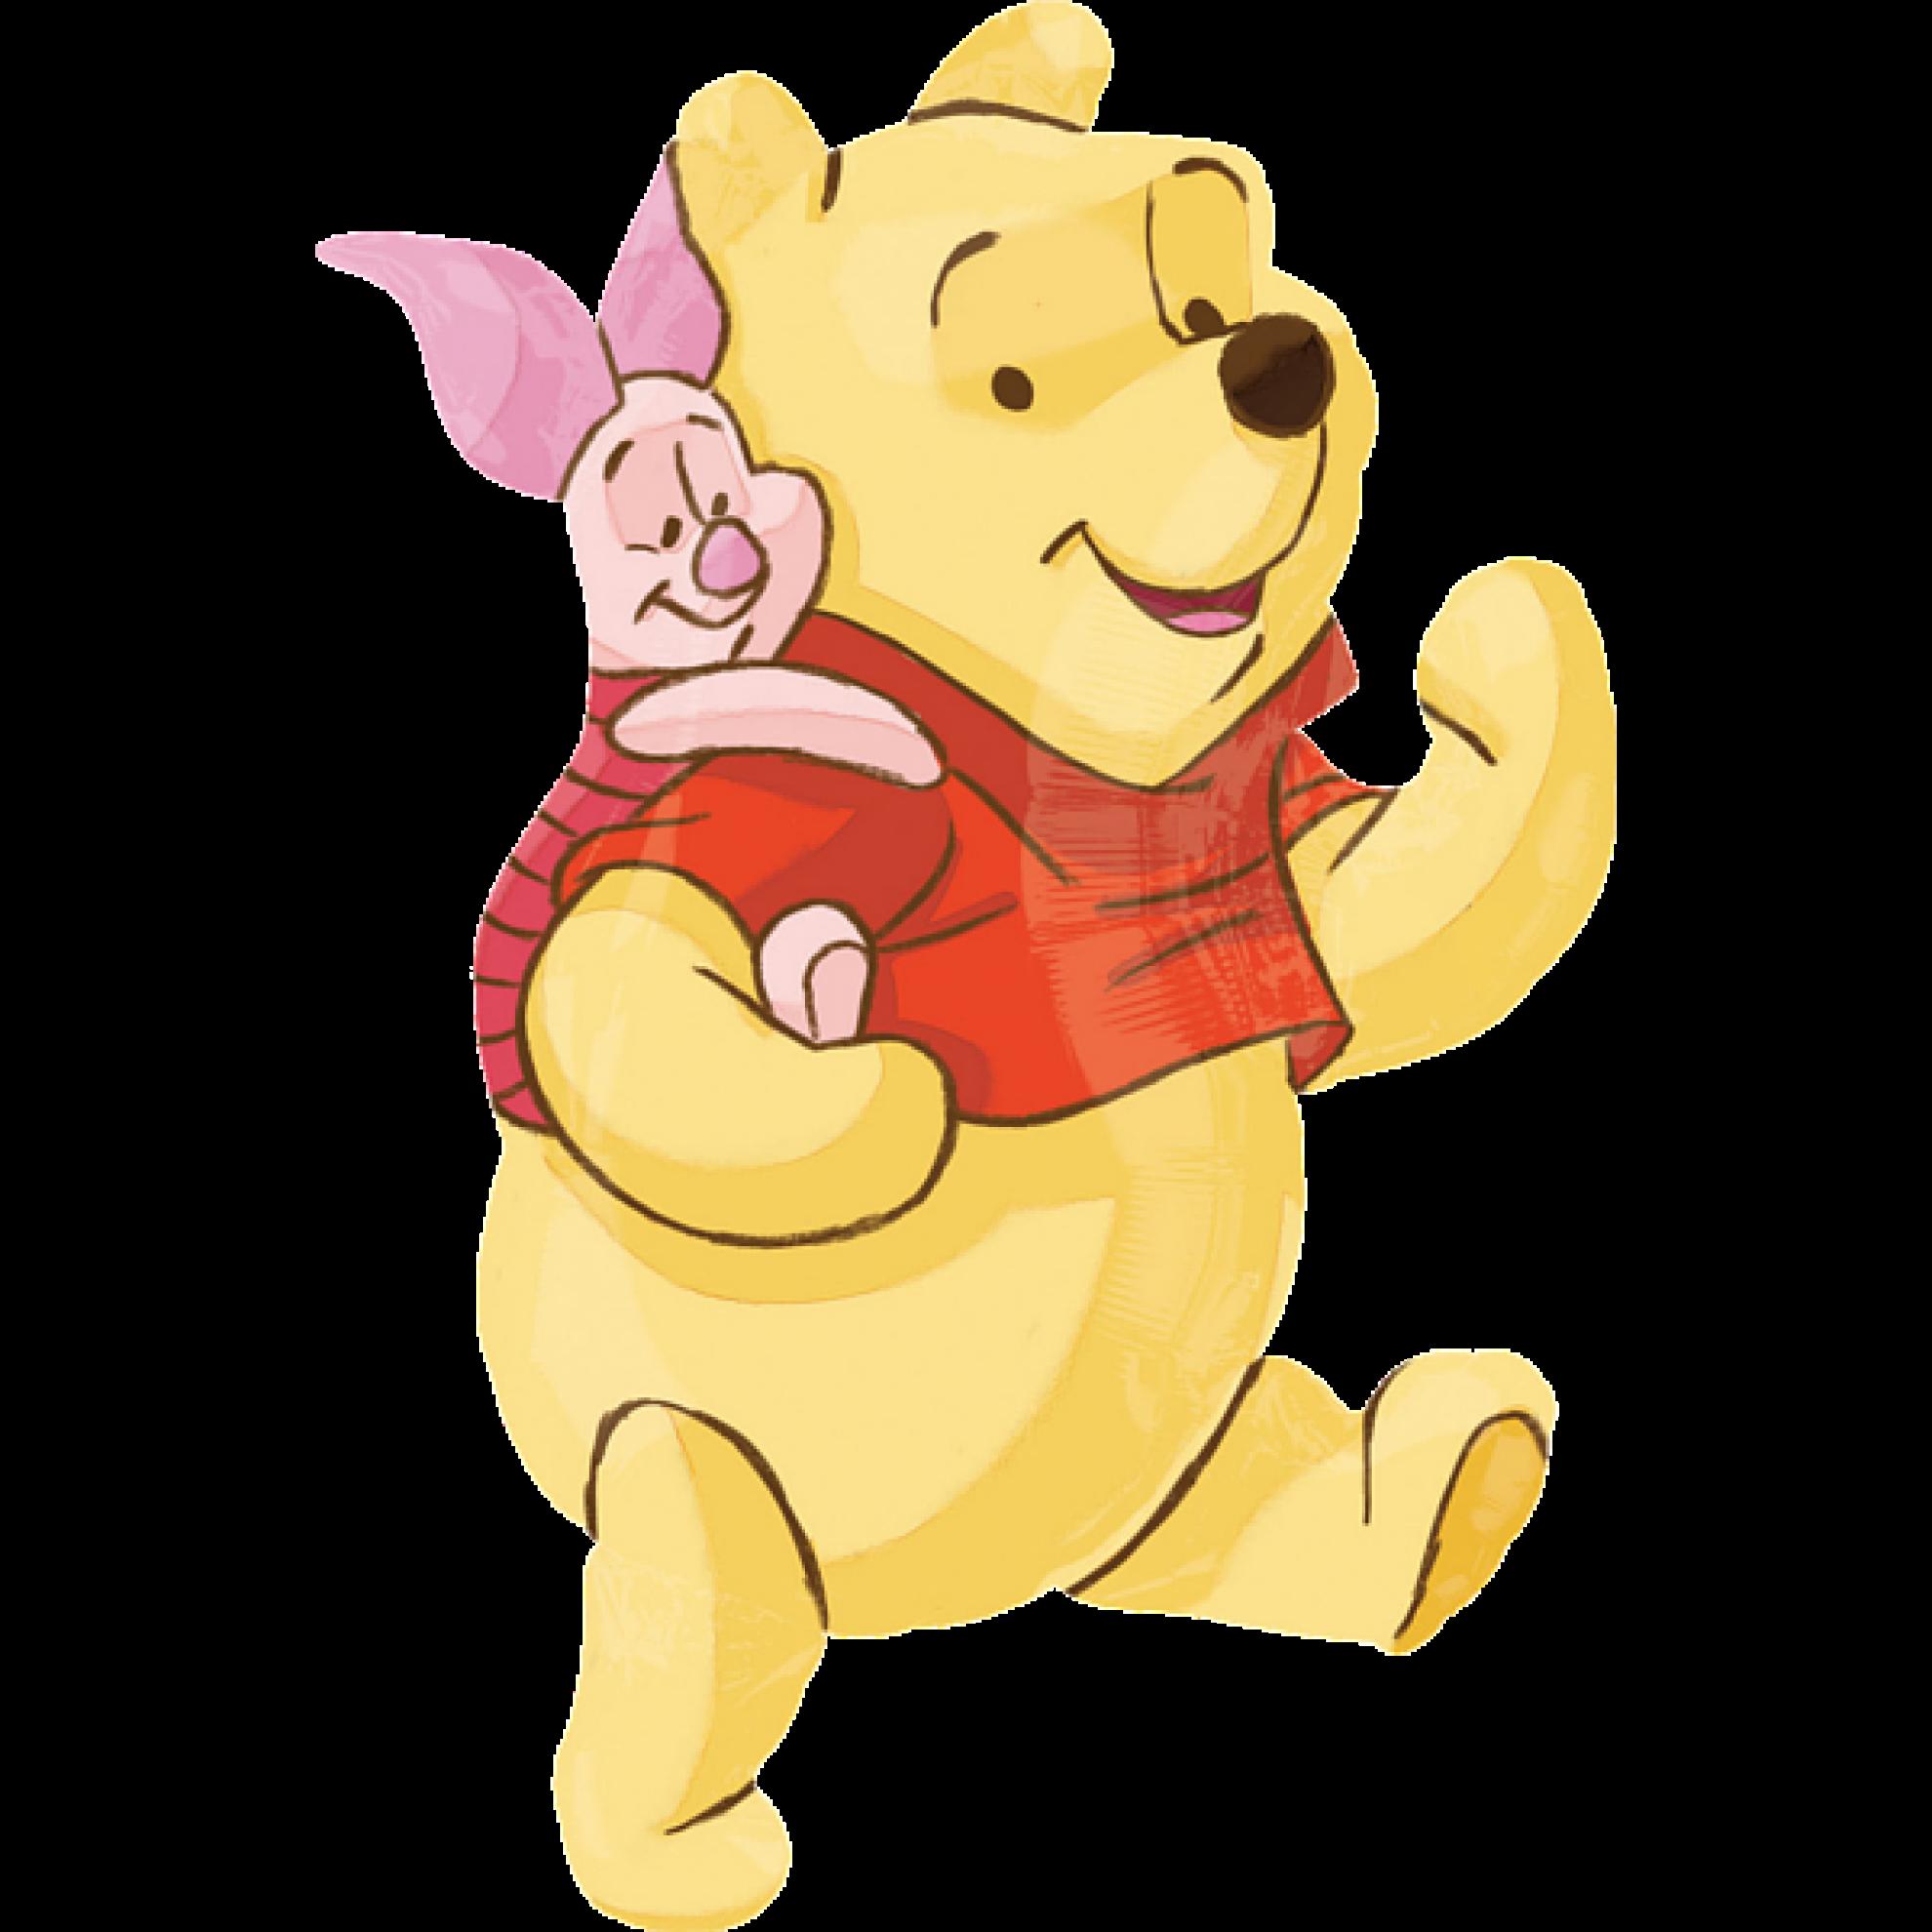 Ferkel Winni Pooh : folienballon winnie pooh ferkel 81 cm ~ Orissabook.com Haus und Dekorationen